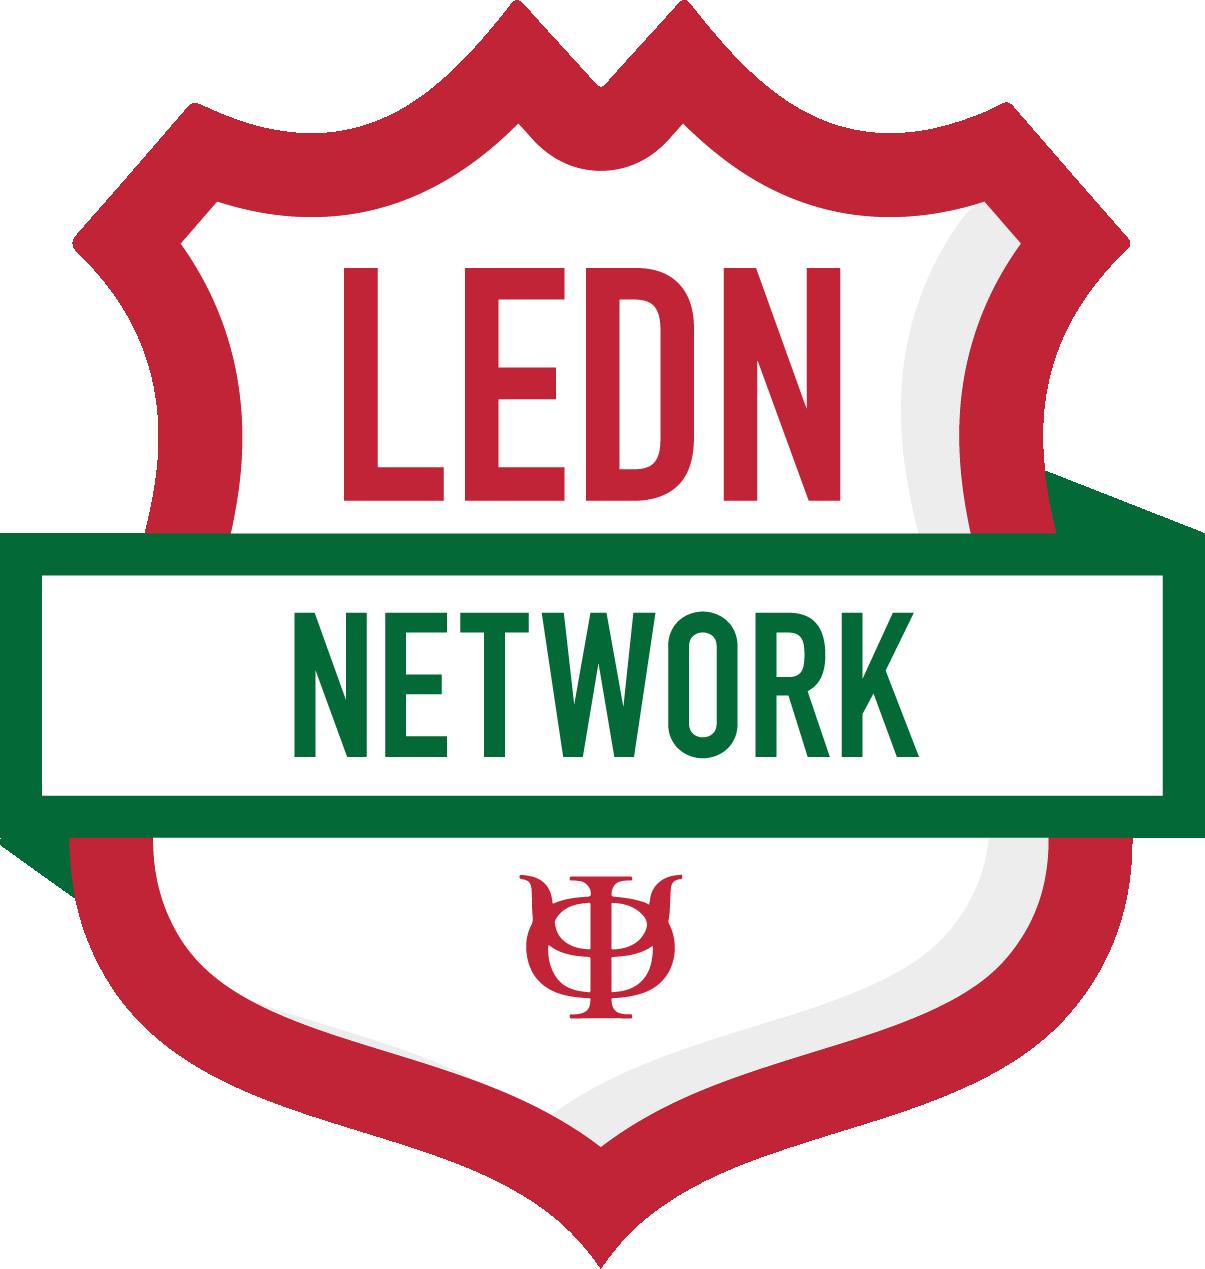 Ledn Network Phi Kappa Psi Fraternity